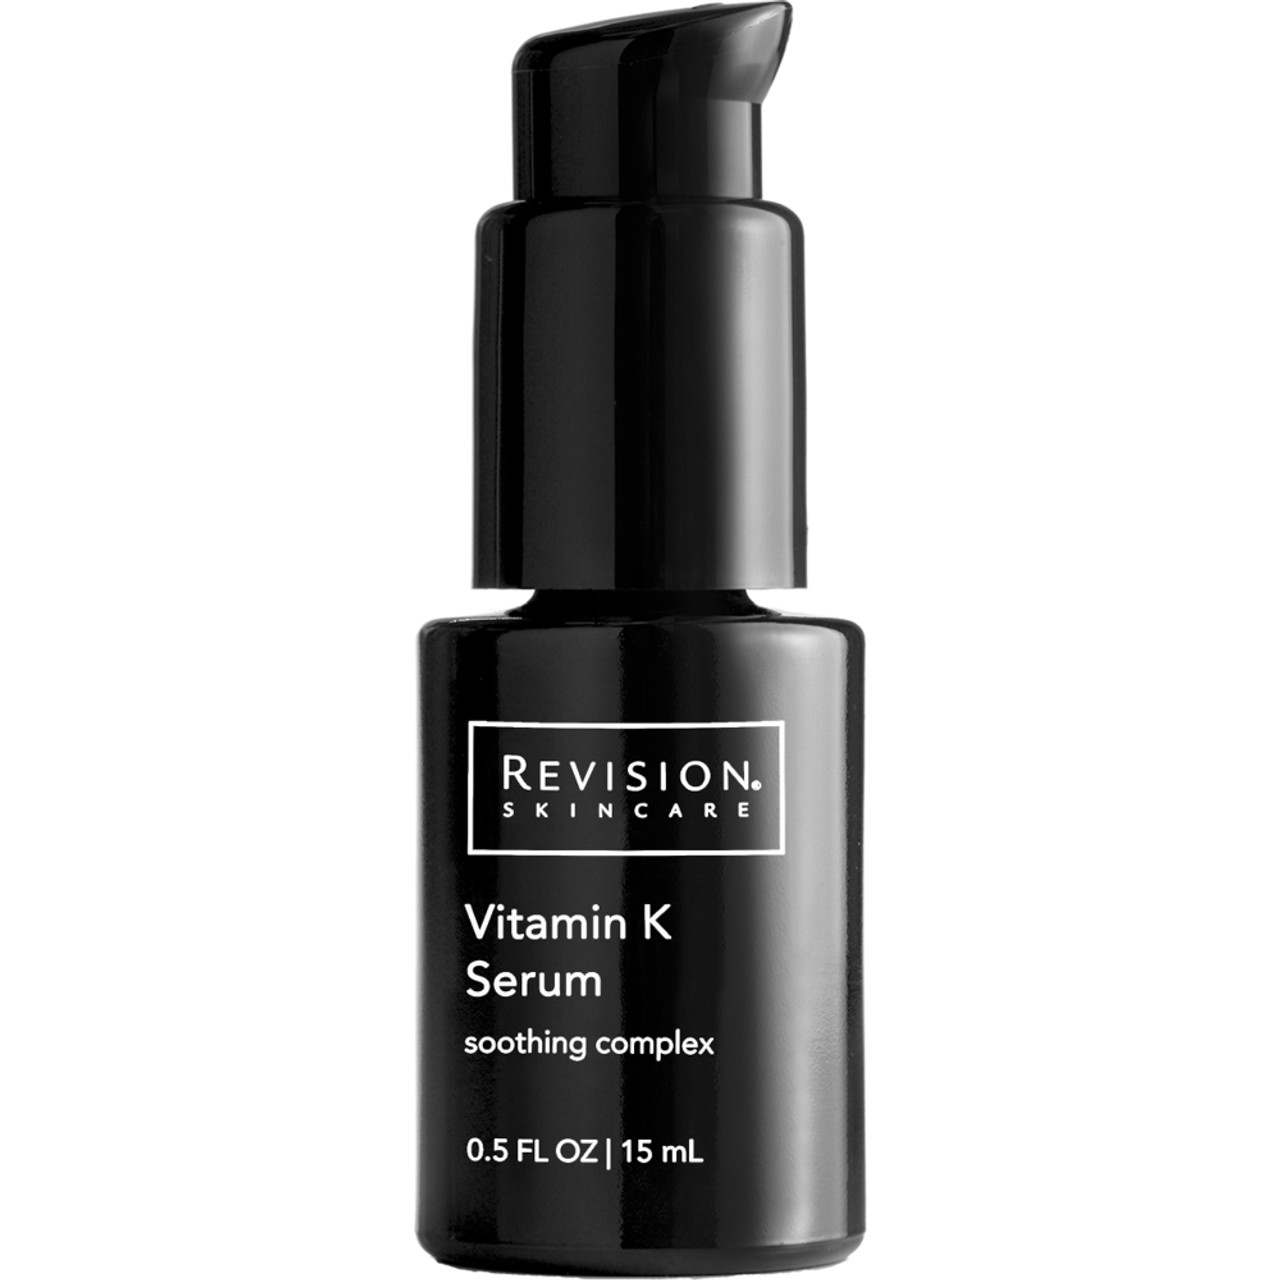 Revision Vitamin K Serum